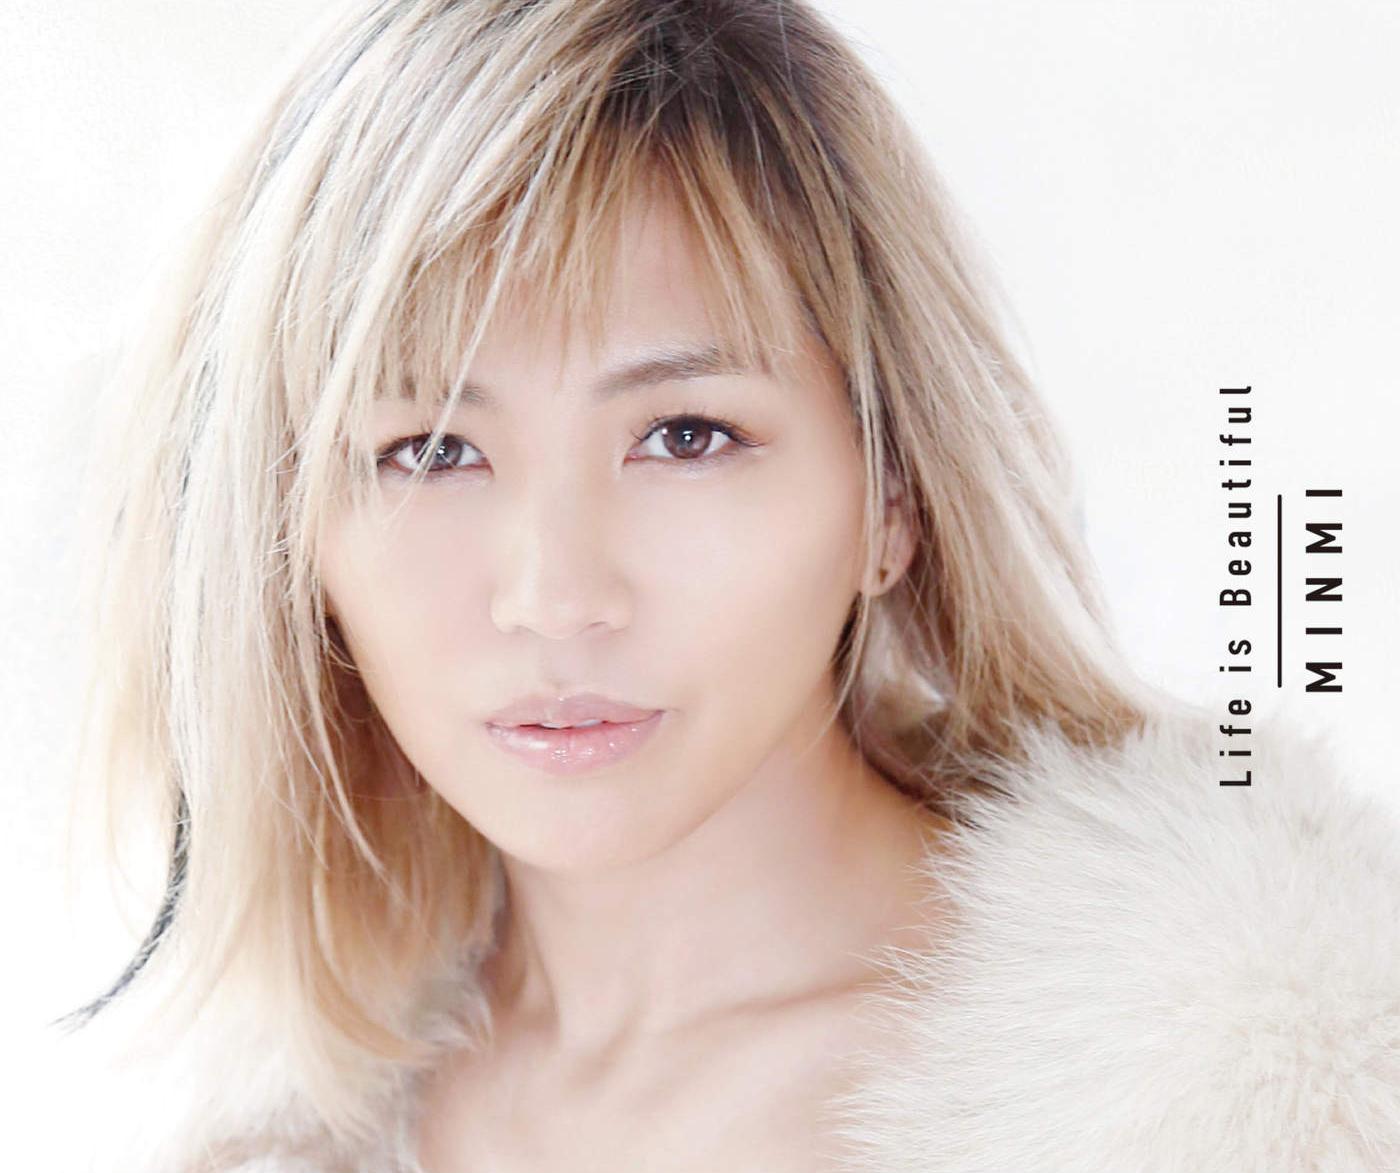 20161230.03.34 MINMI - Life is Beautiful cover.jpg